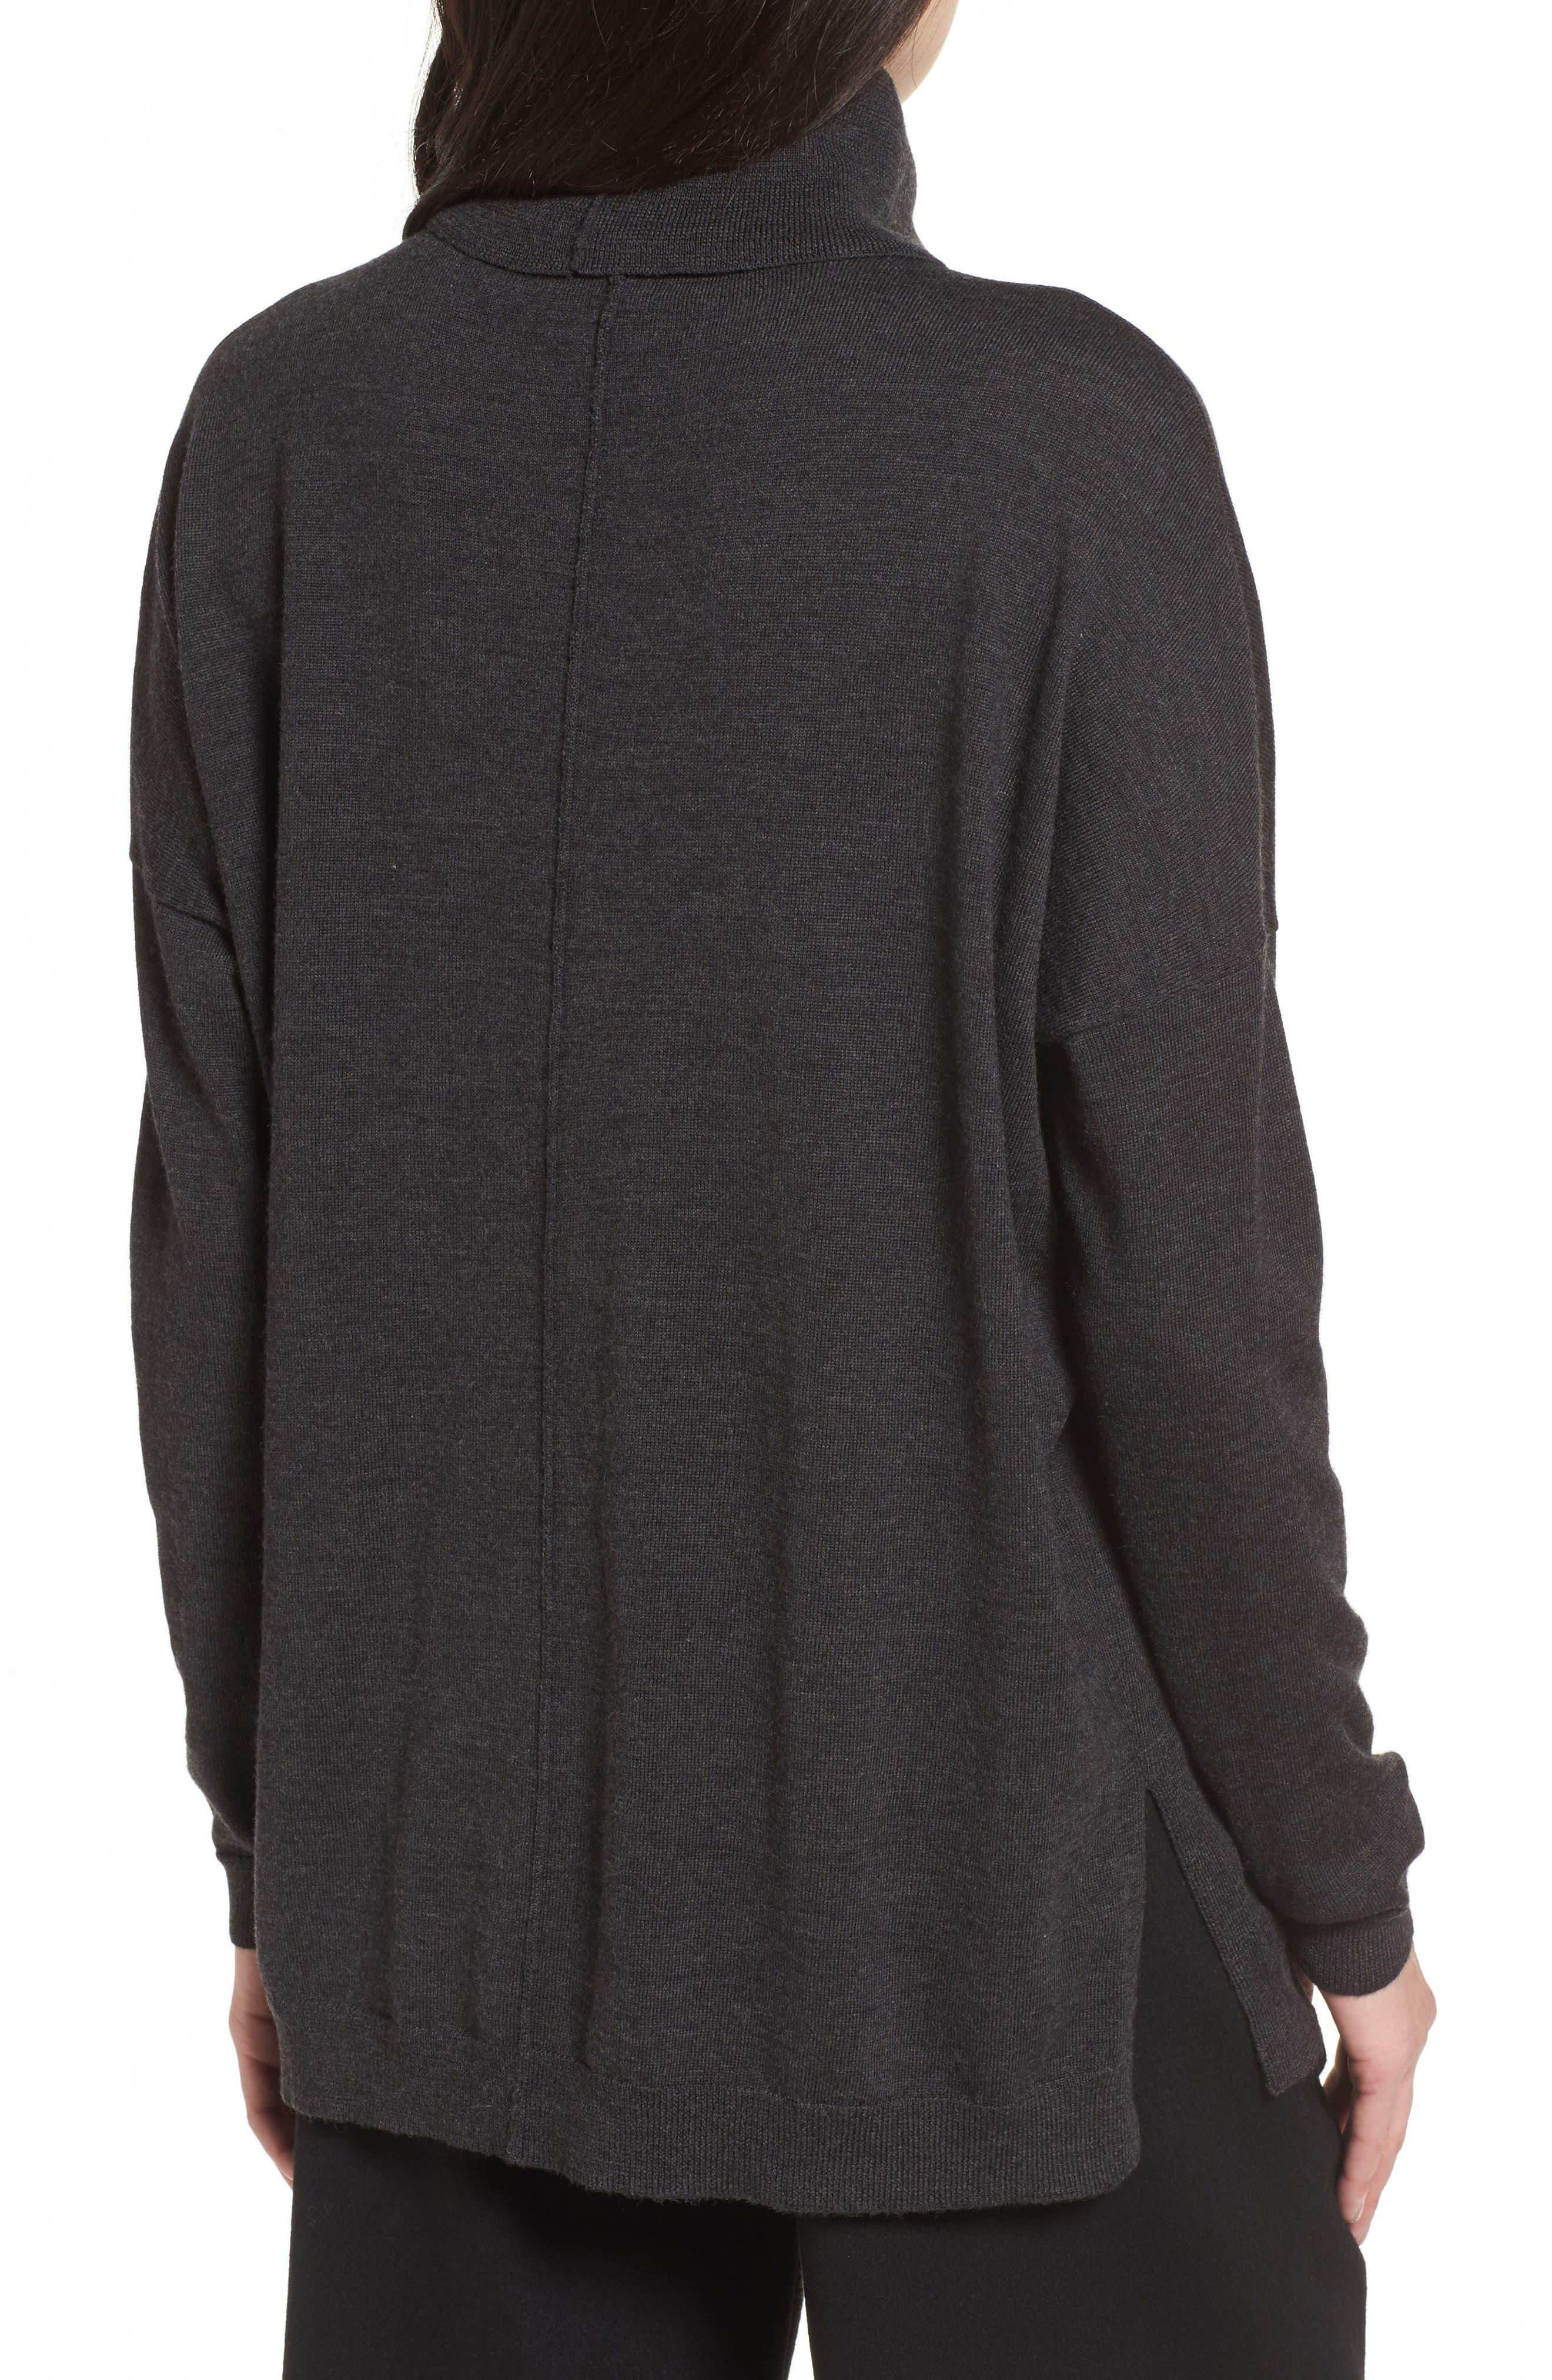 Merino Wool Boxy Turtleneck Sweater,                             Alternate thumbnail 2, color,                             021